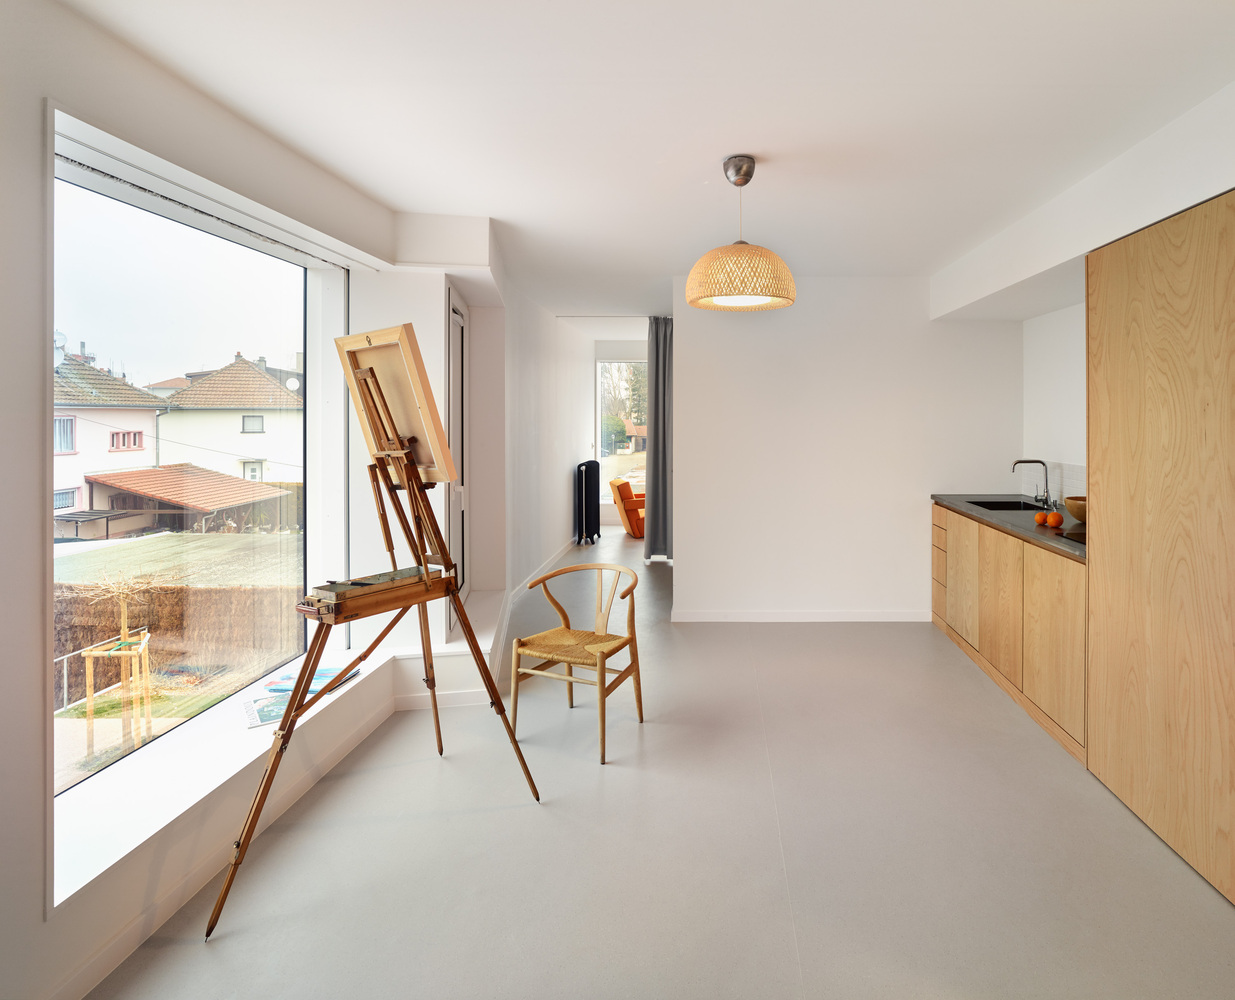 Housing for Elderly People in Huningue